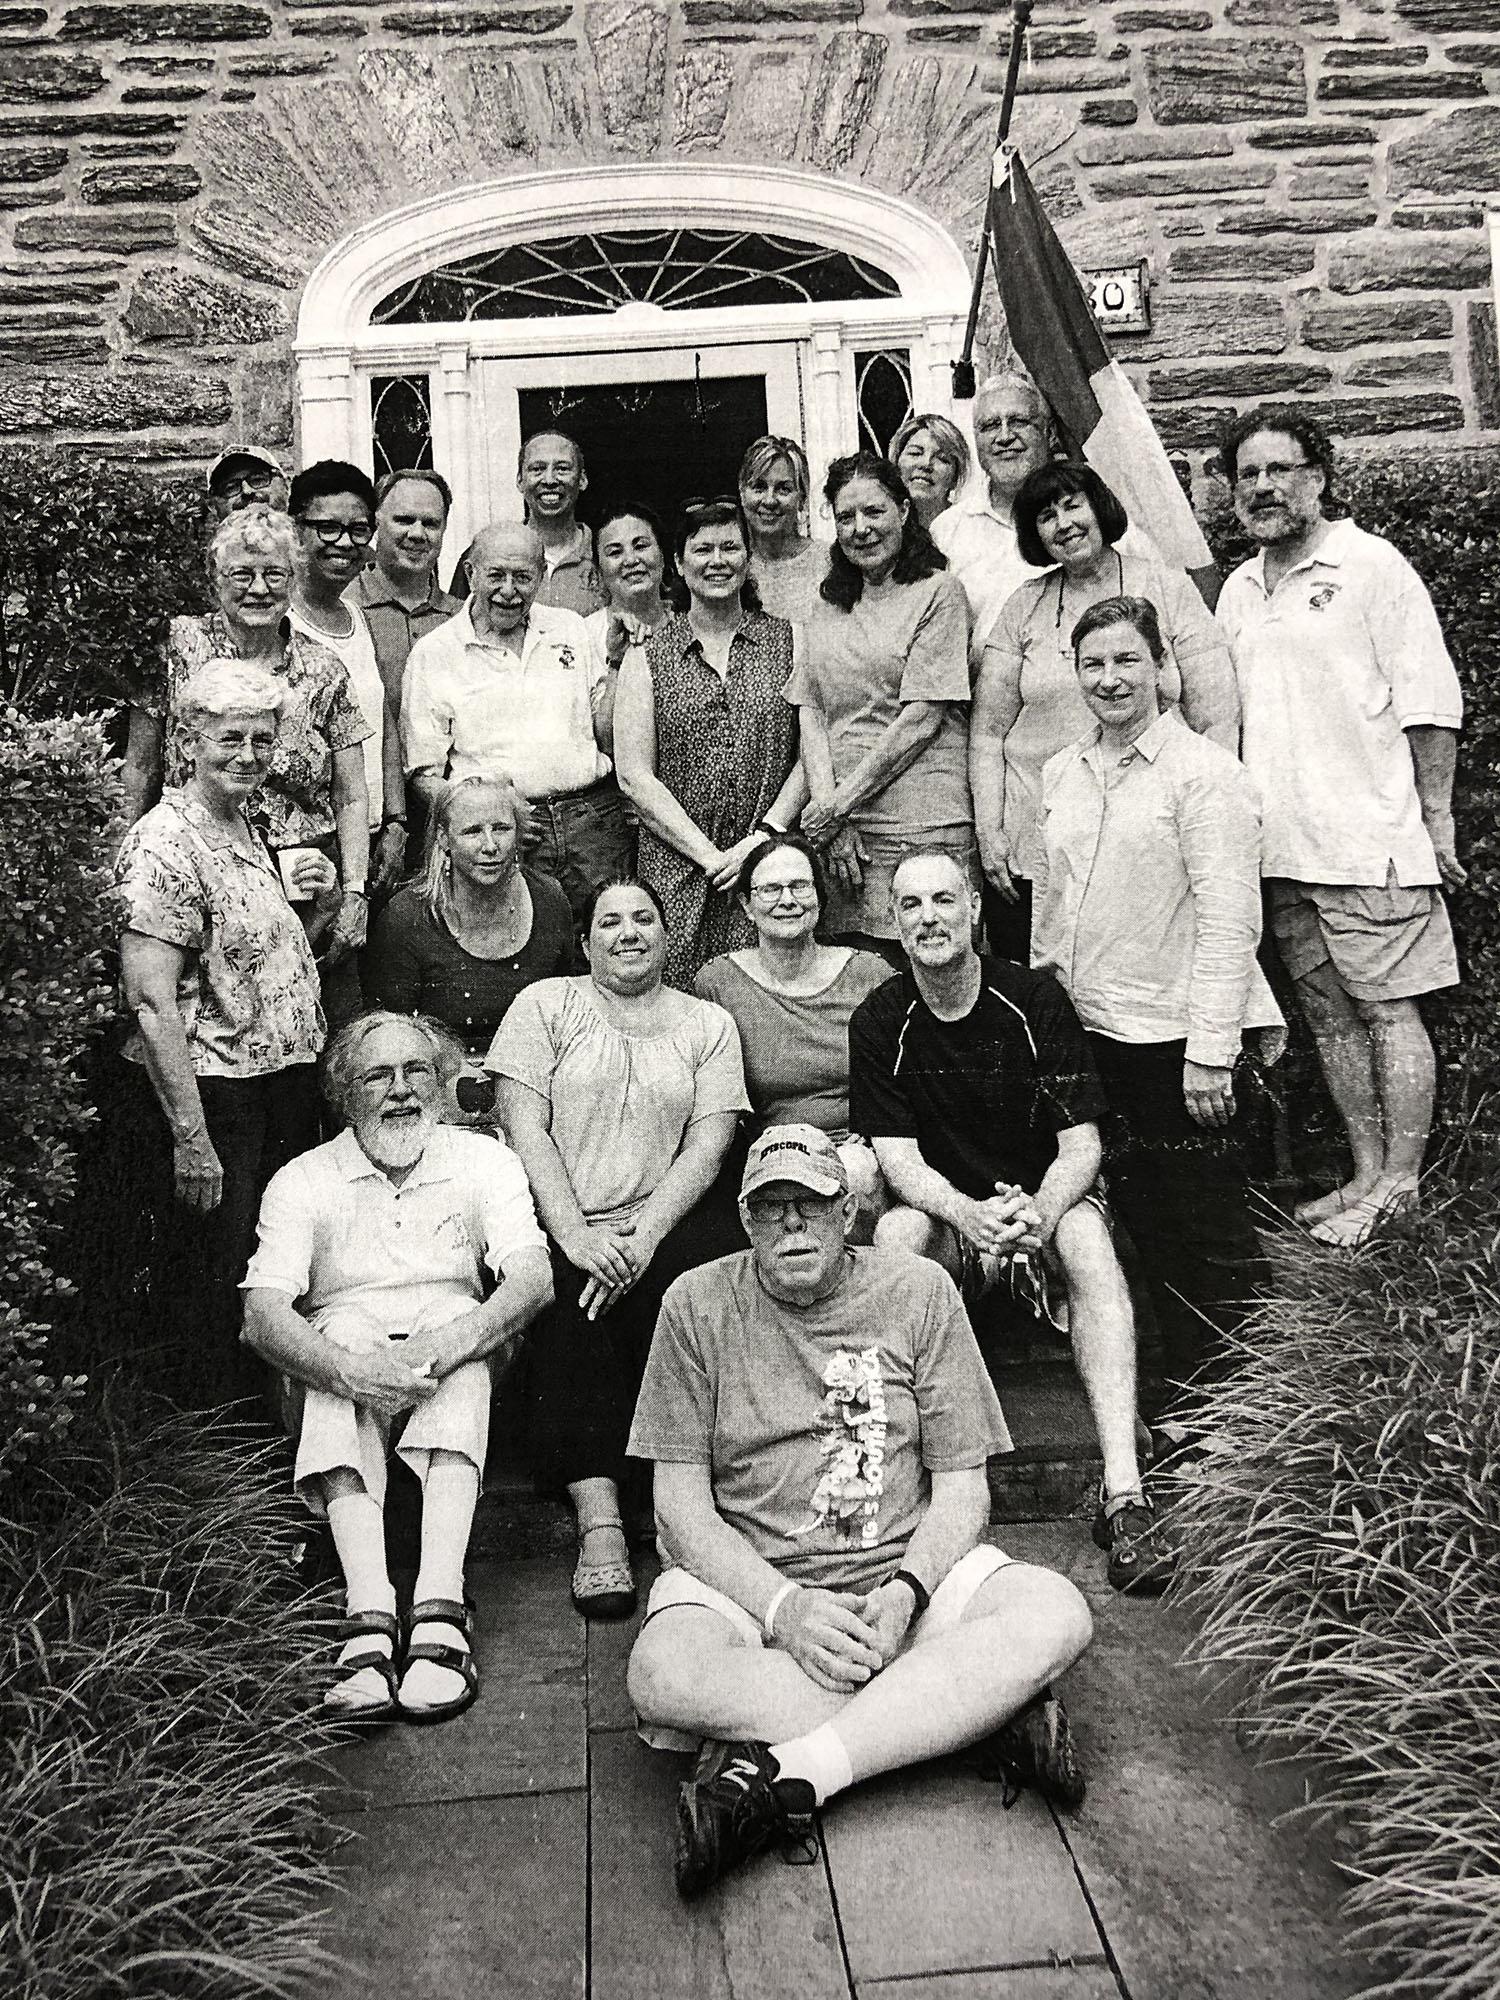 Front row: Mike Letts. Second row (l. to r.): Jim Saxon, Lyn Podolski, Bere Saxon and Brian Deppen. Third row (l. to r.): Judy Politzer, Beth McErlean and Catherine King. Fourth row (l. to r.): Betty Dowling, Joe Torregrossa, Betsy Larsen, Heather Gray, Beth Jones and Howard Garfinkel. Back row (l. to r.): Grady Harrington, Delma Broussard, Pat McErlean, Ray Johnston, Susan Wendt, Pat Donato, Sondra Mervine and Gary King